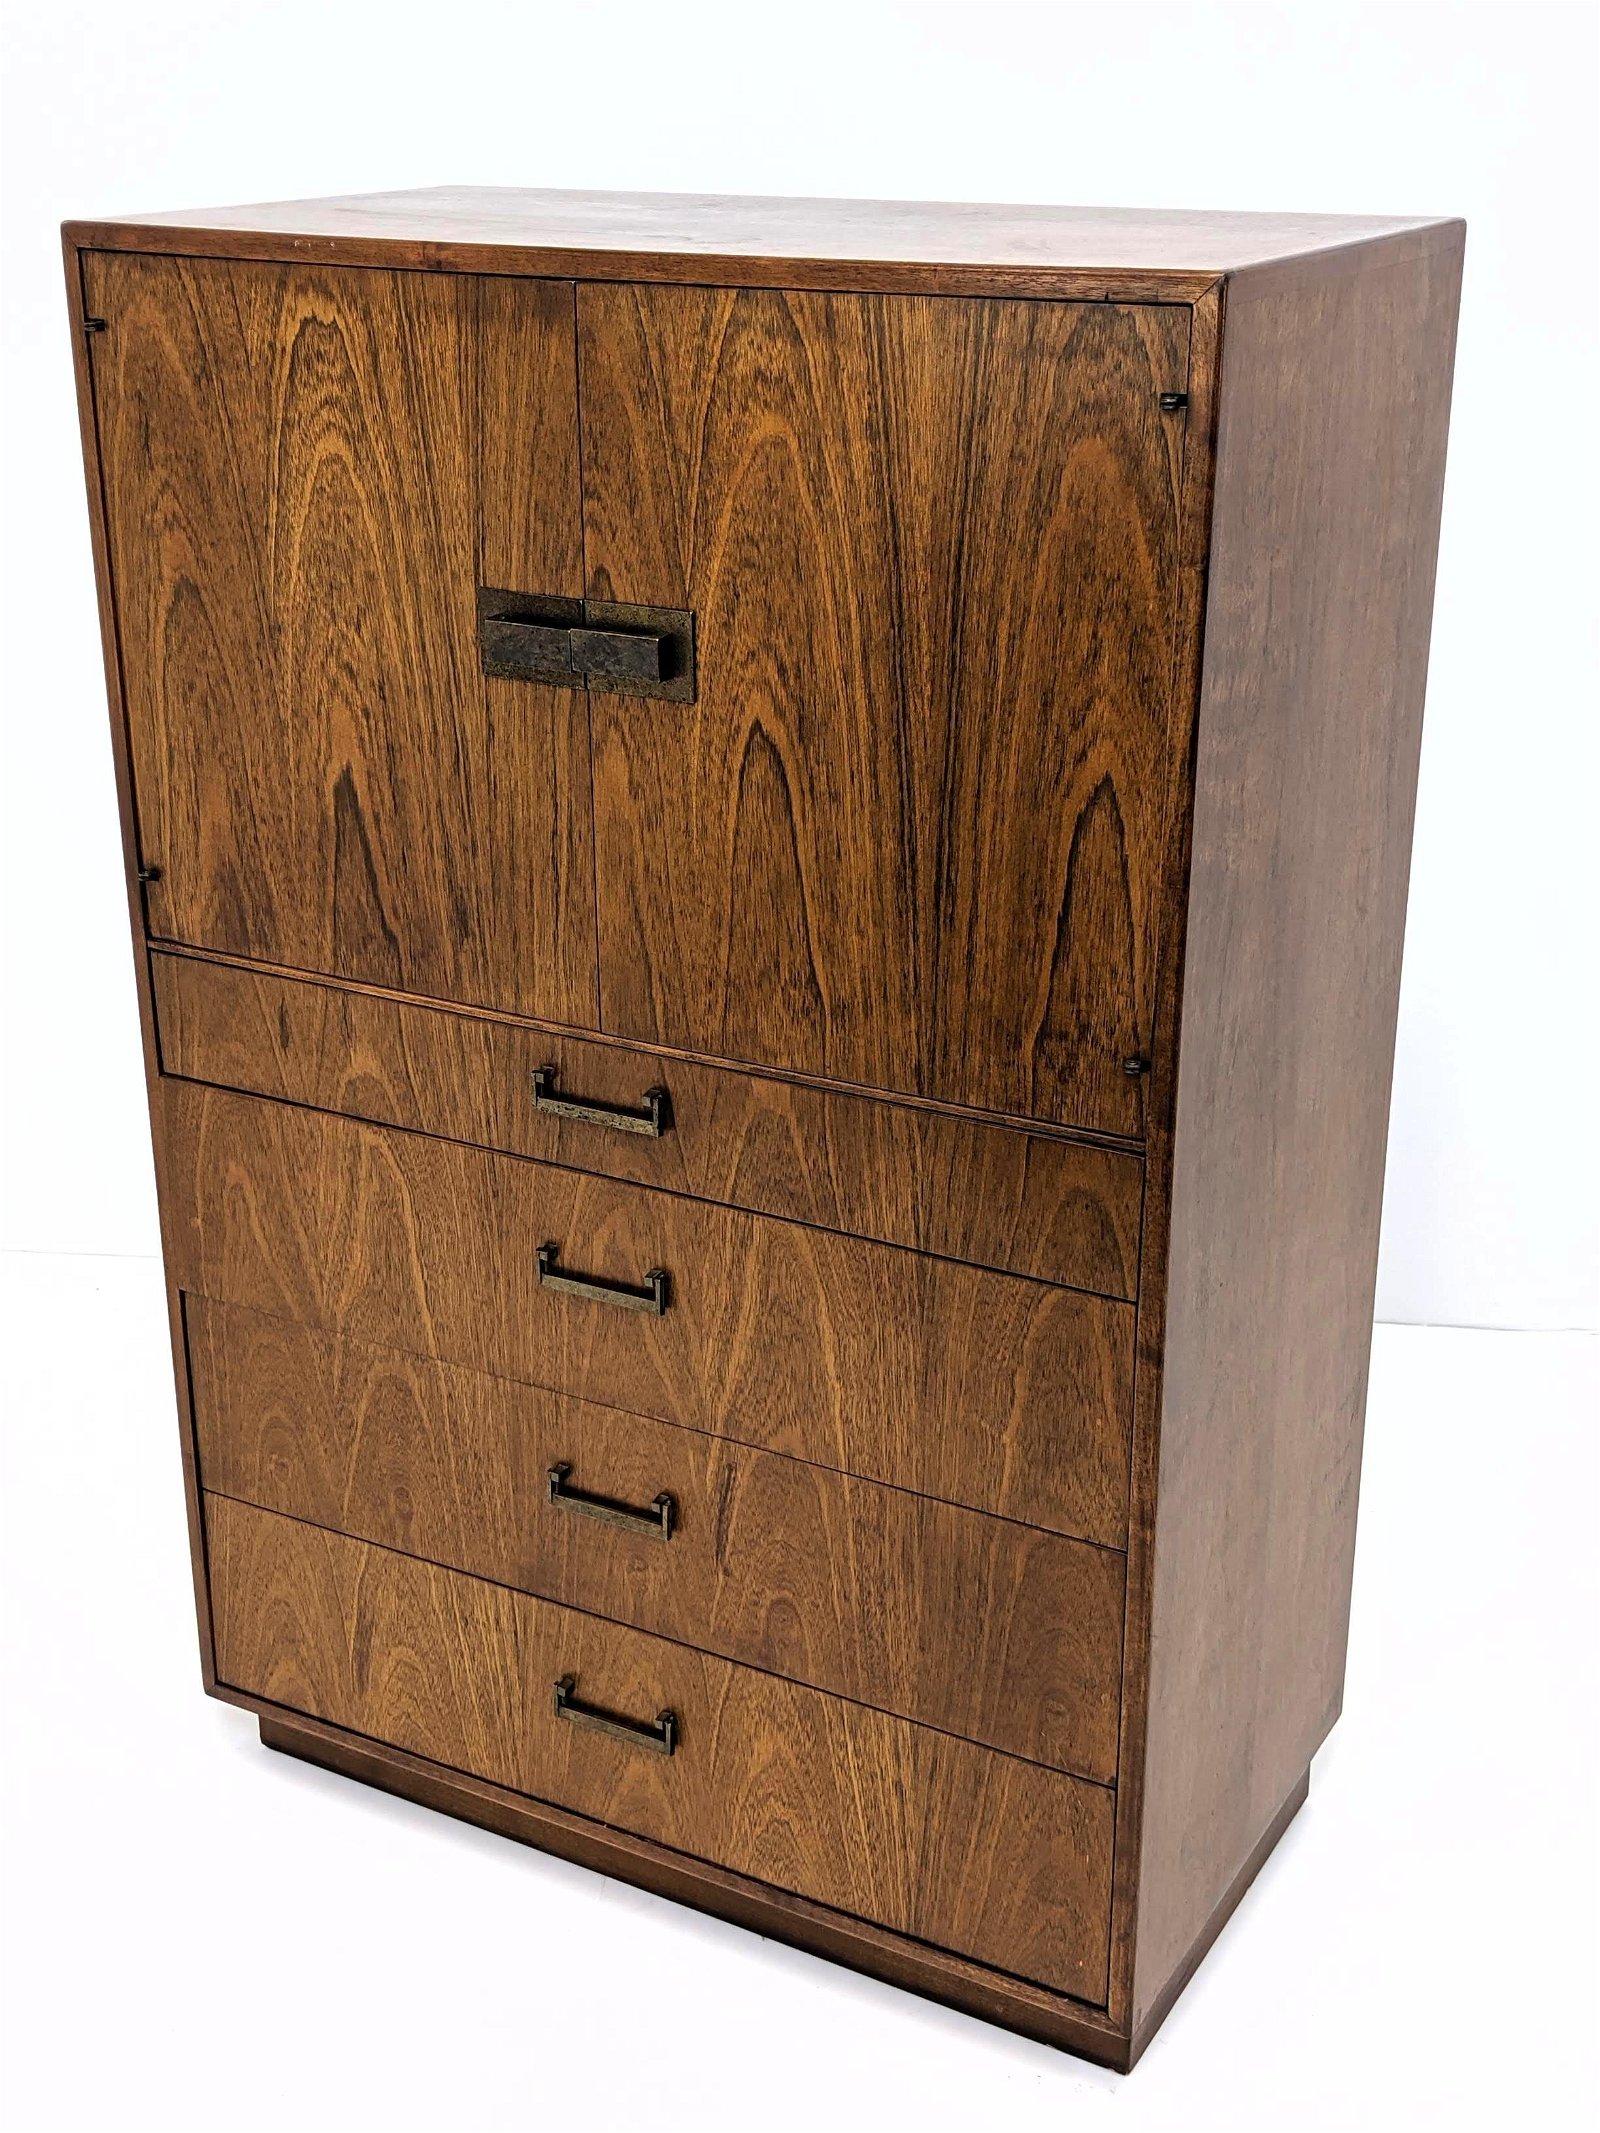 FOUNDERS American Modern Walnut Tall Chest Dresser. Two